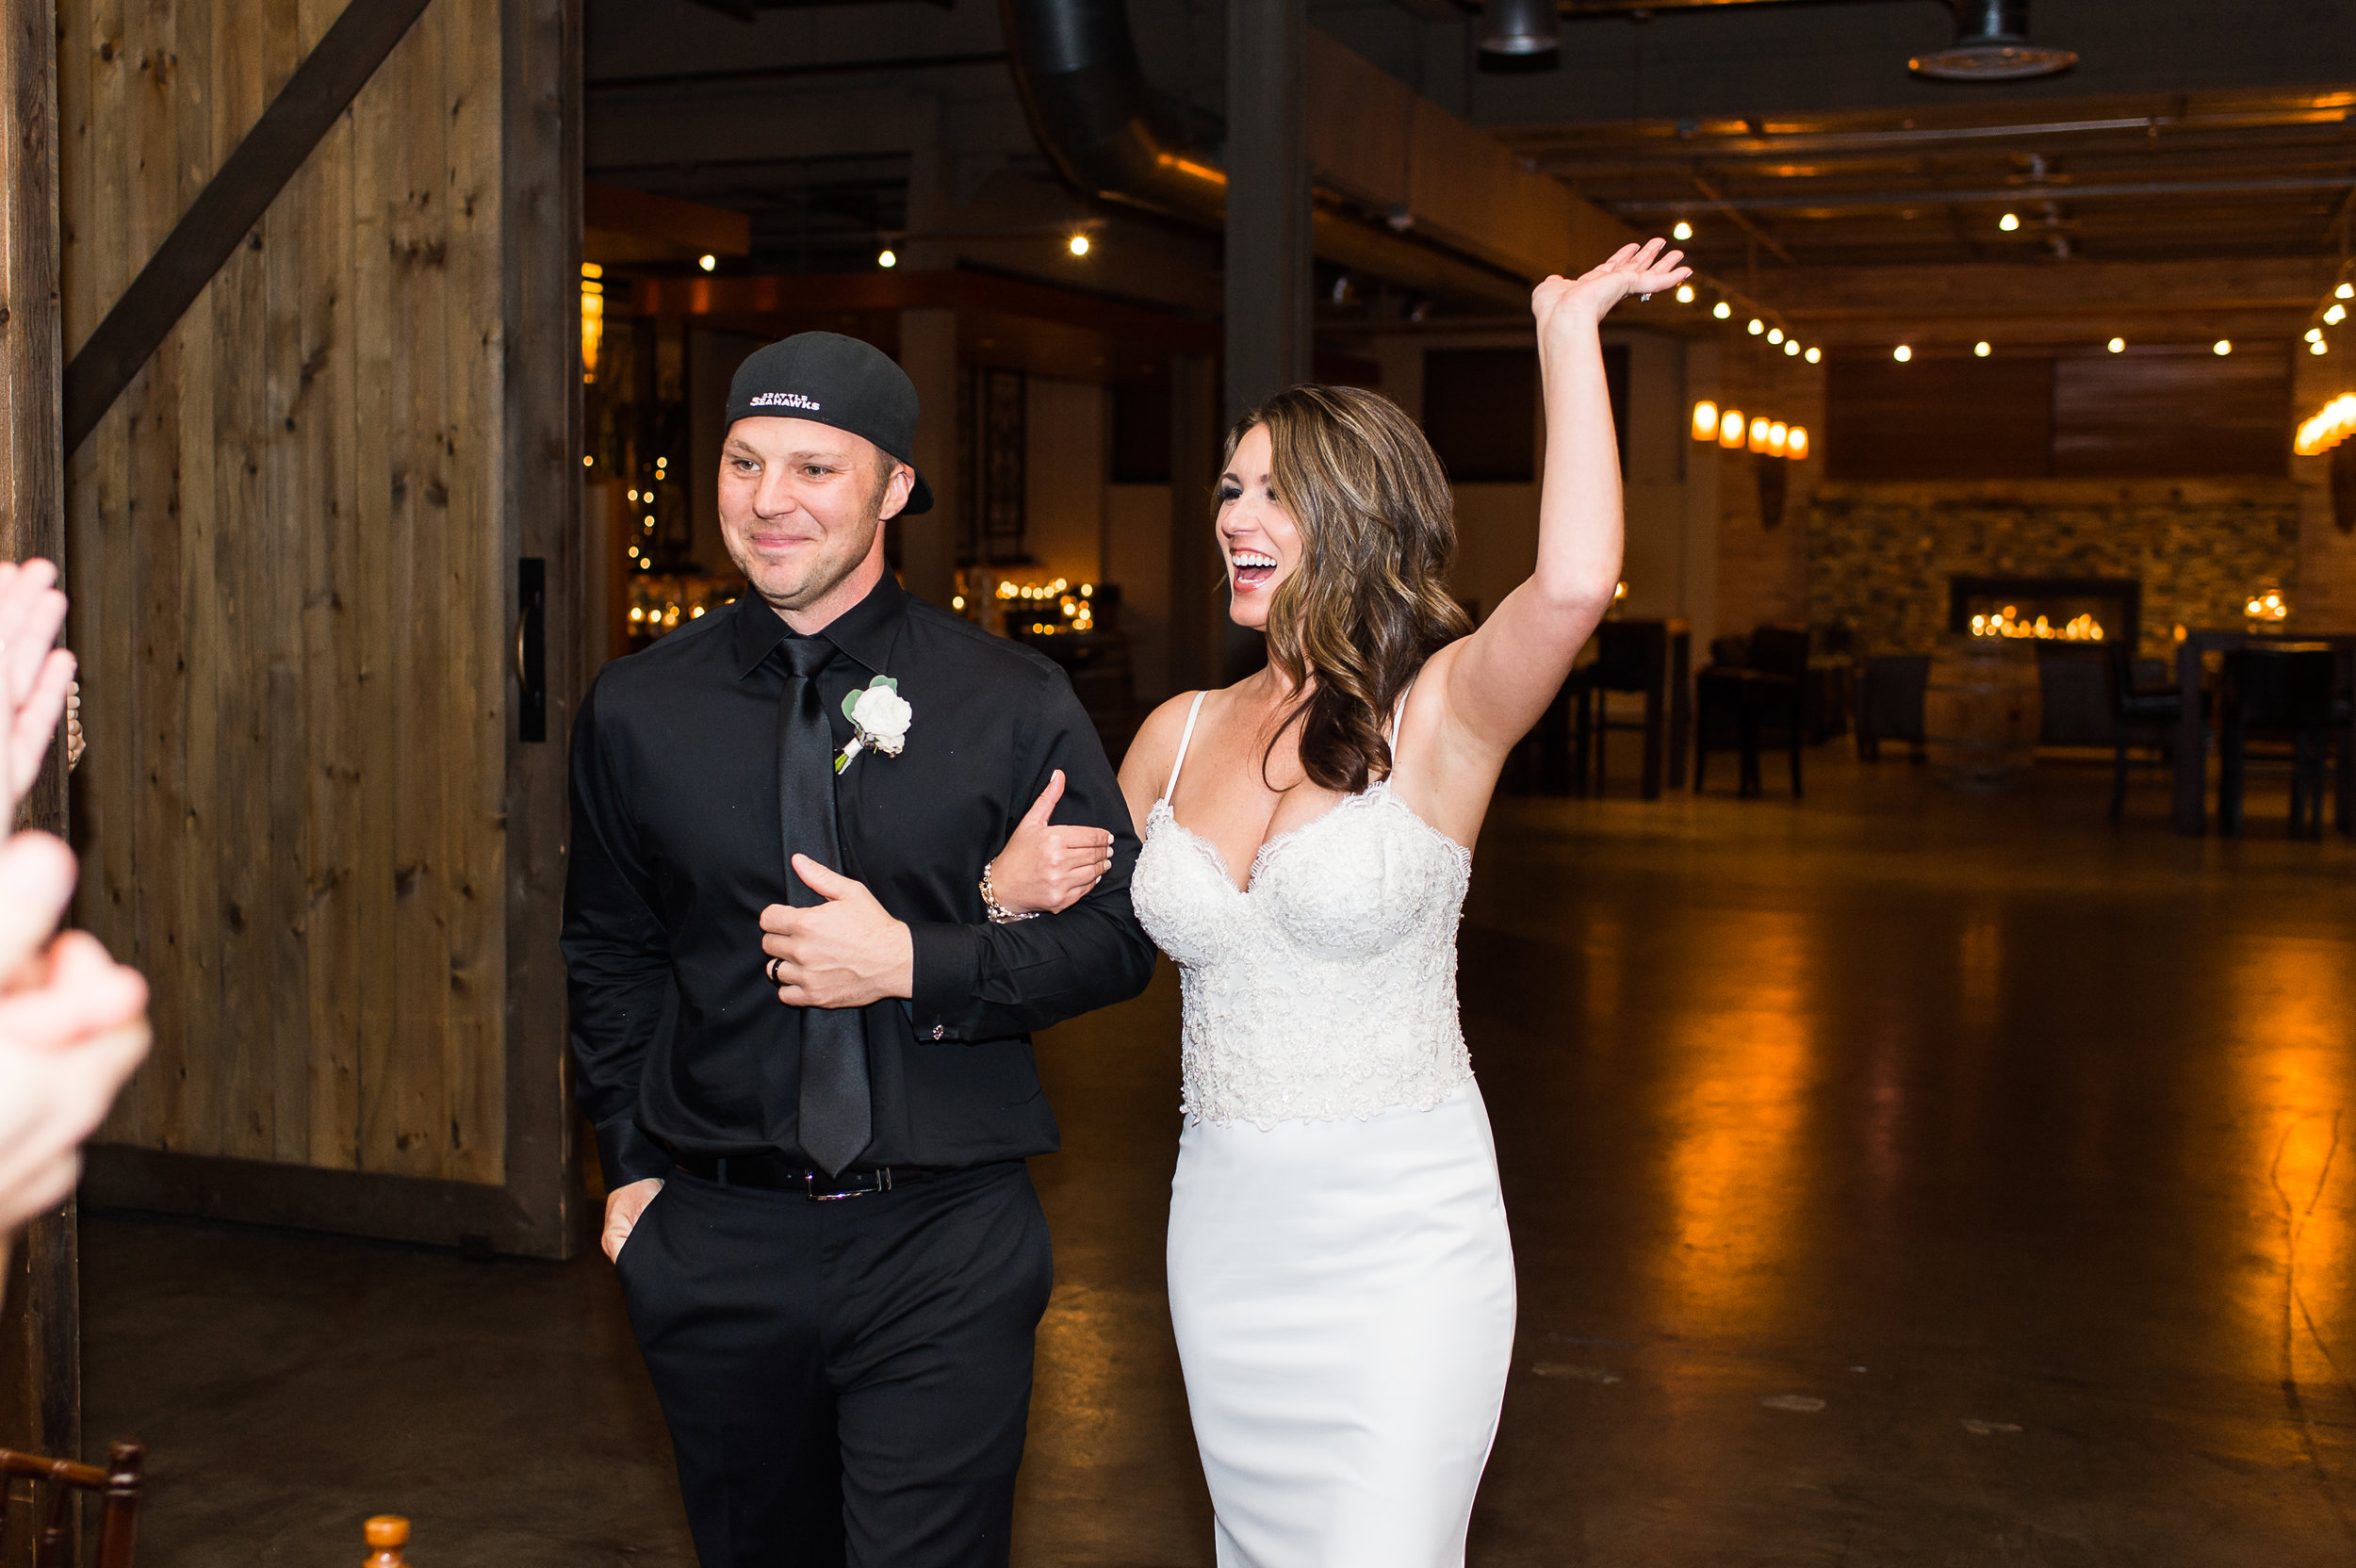 JJ-wedding-Van-Wyhe-Photography-490.jpg